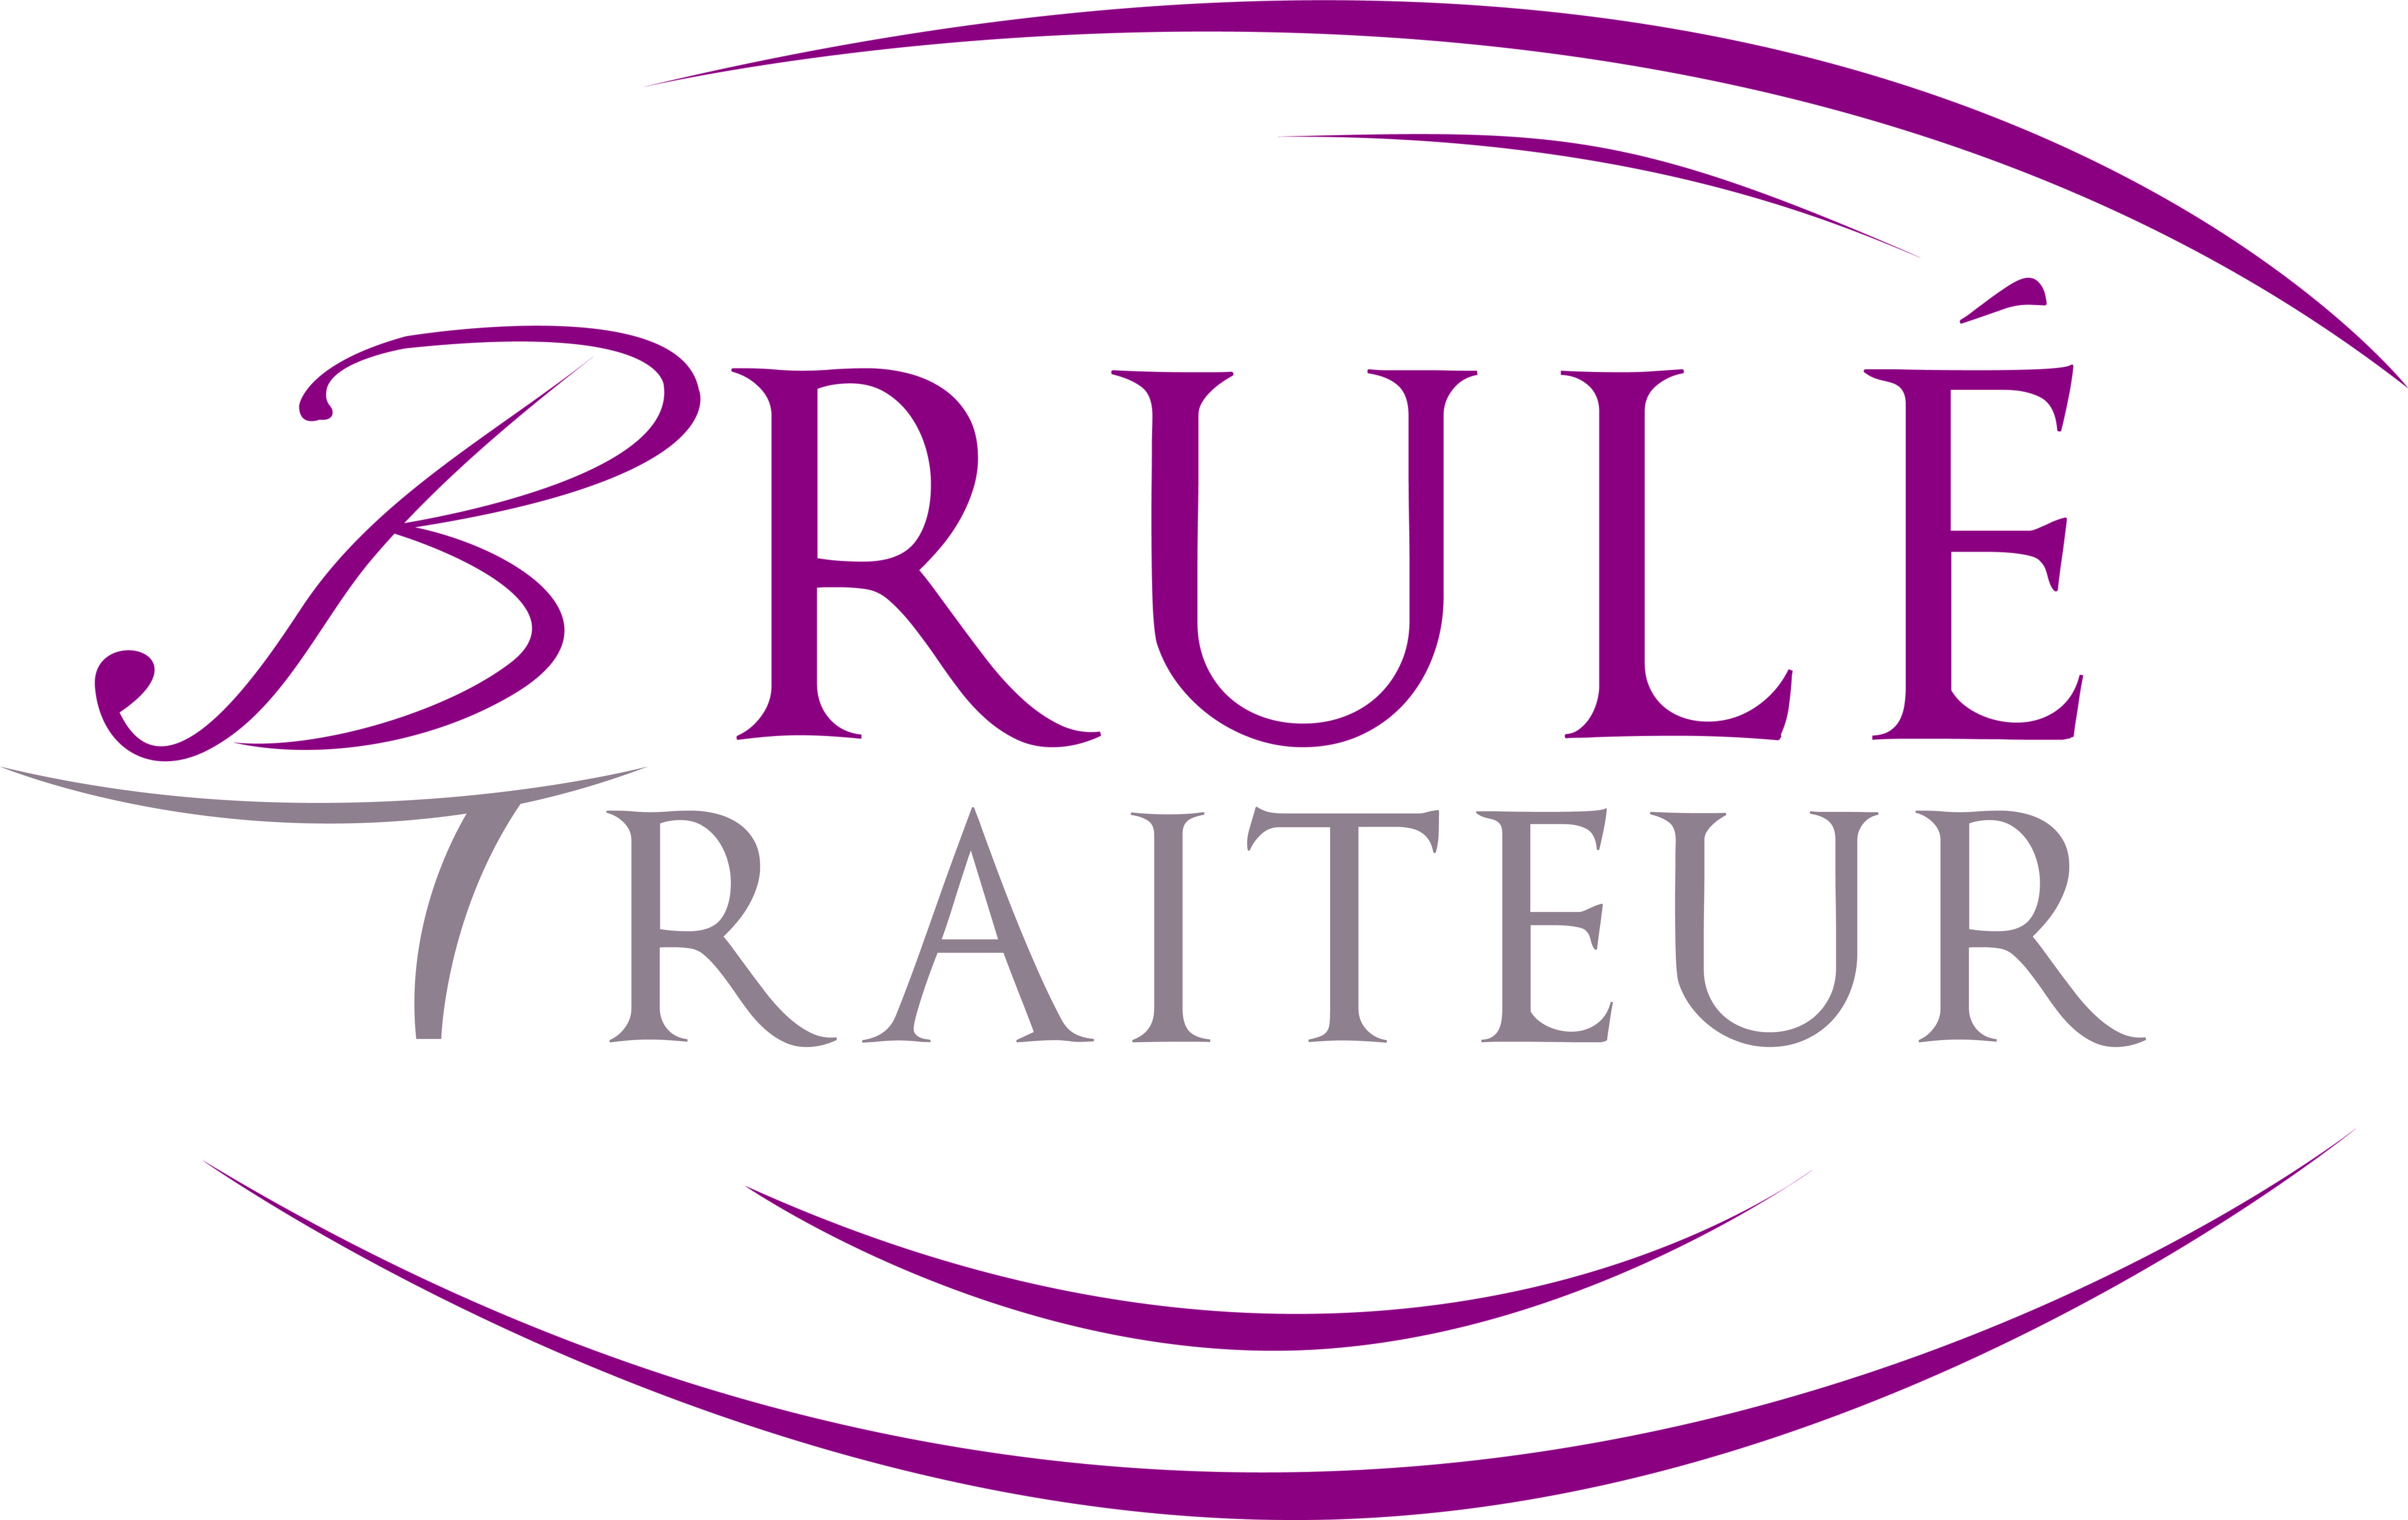 Brule-traiteur